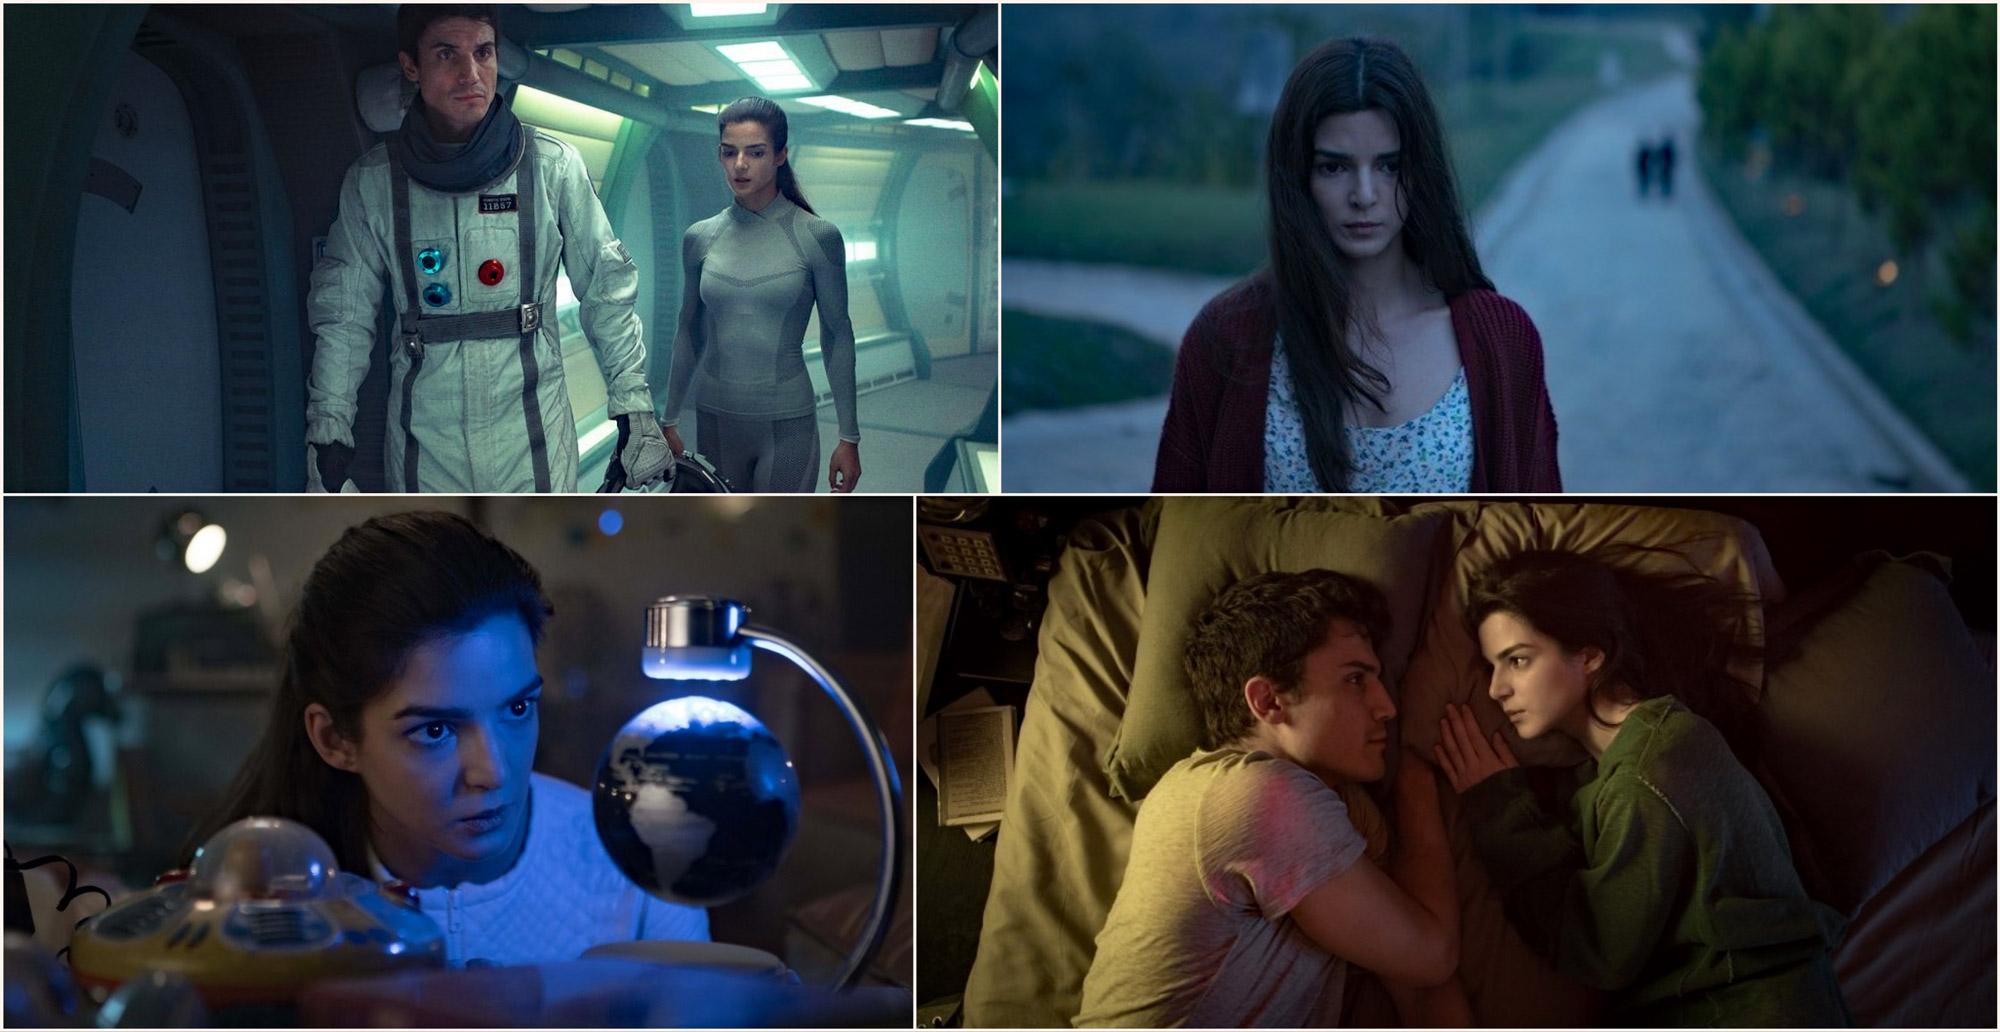 Orbiter 9 (2017) - Clara Lago as Helena